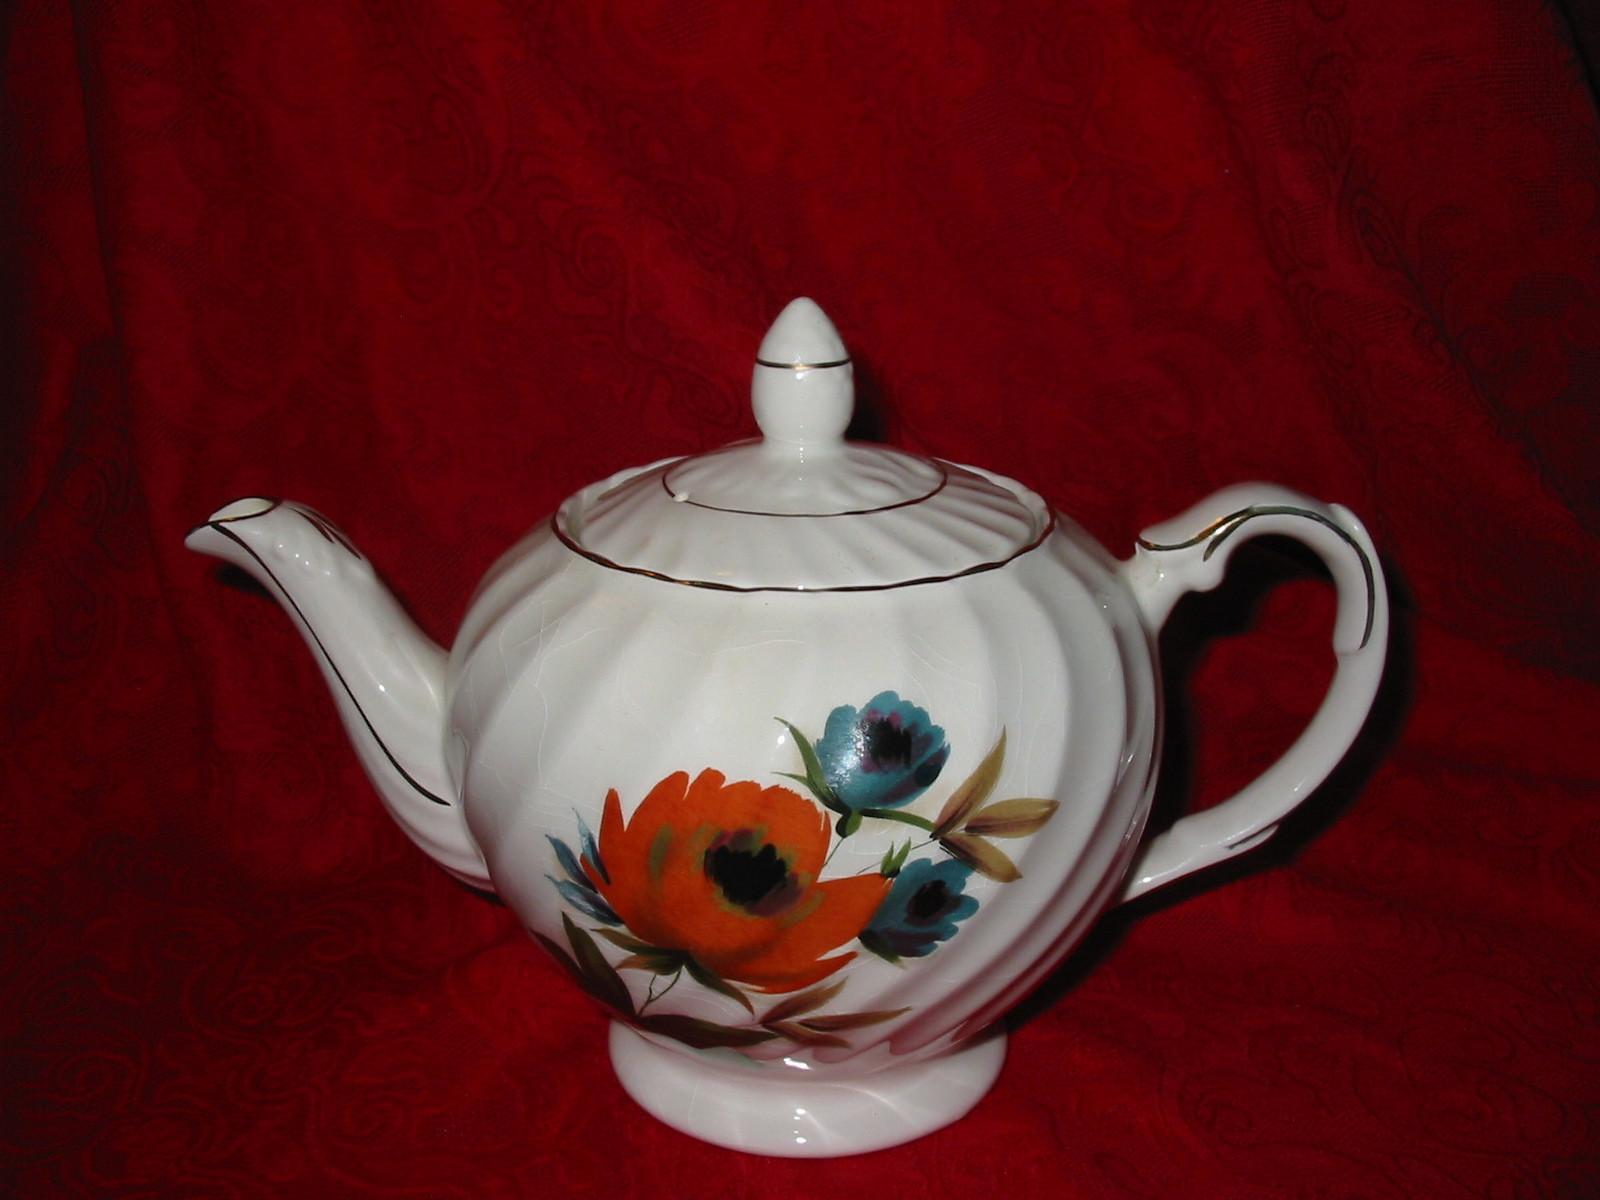 Vintage Ellgreave England Teapot